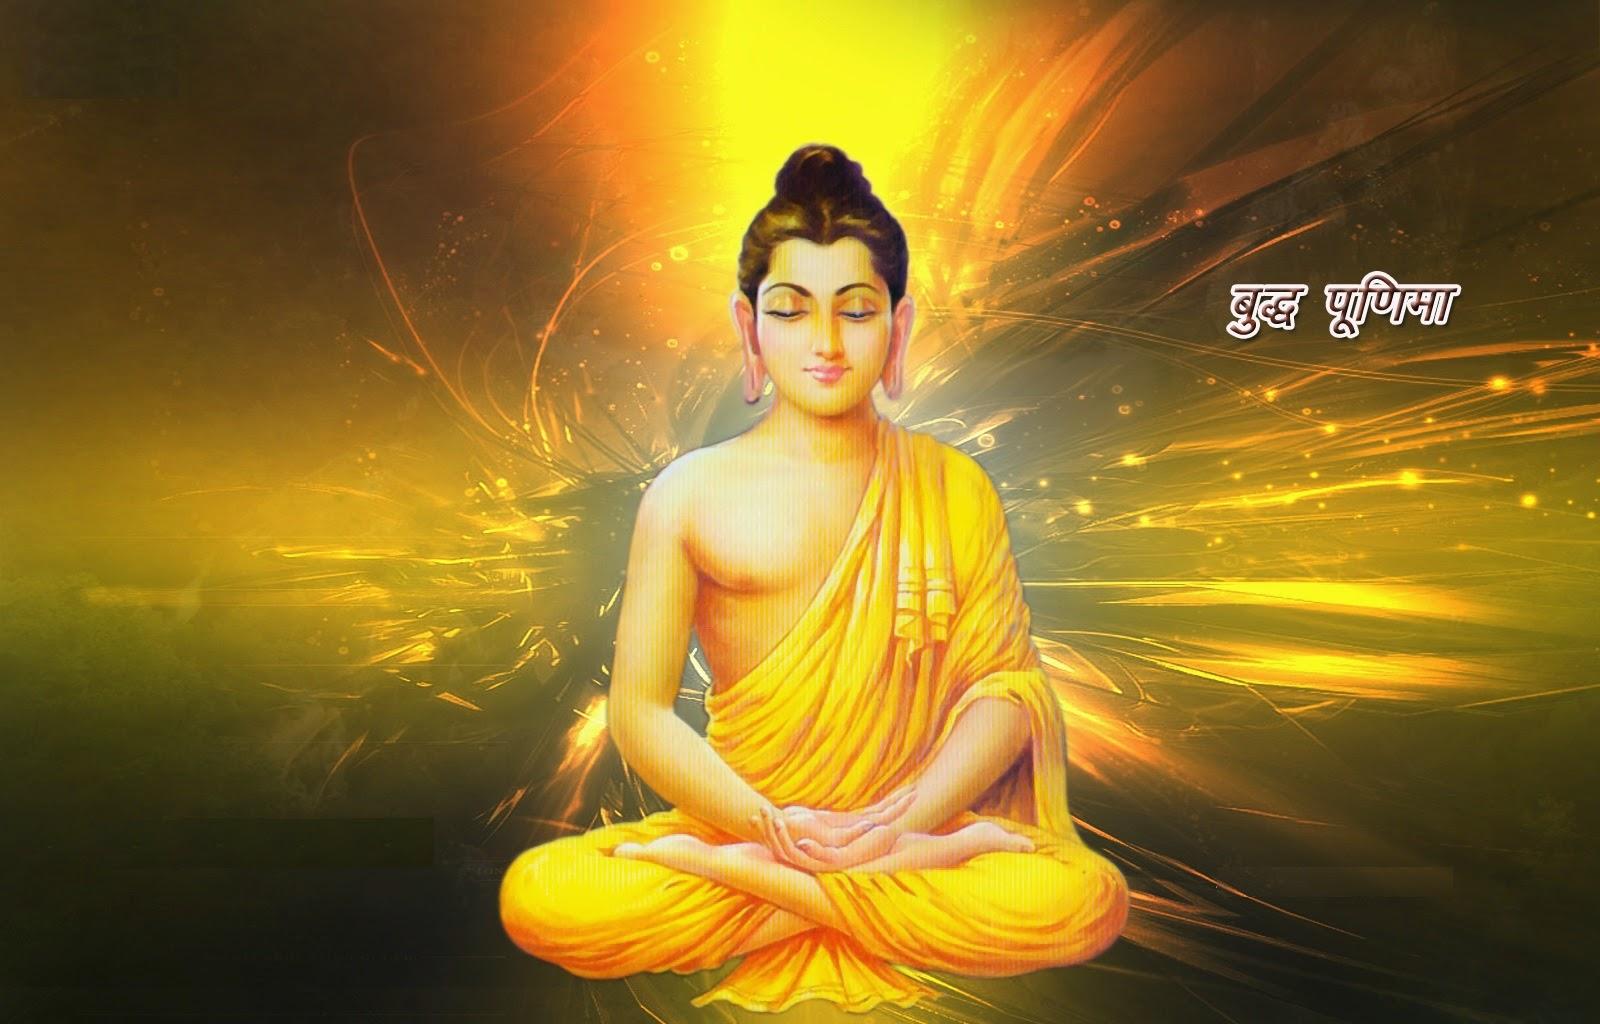 mahatma budh image  World of Wise: Precious wisdom from Mahatma Buddha